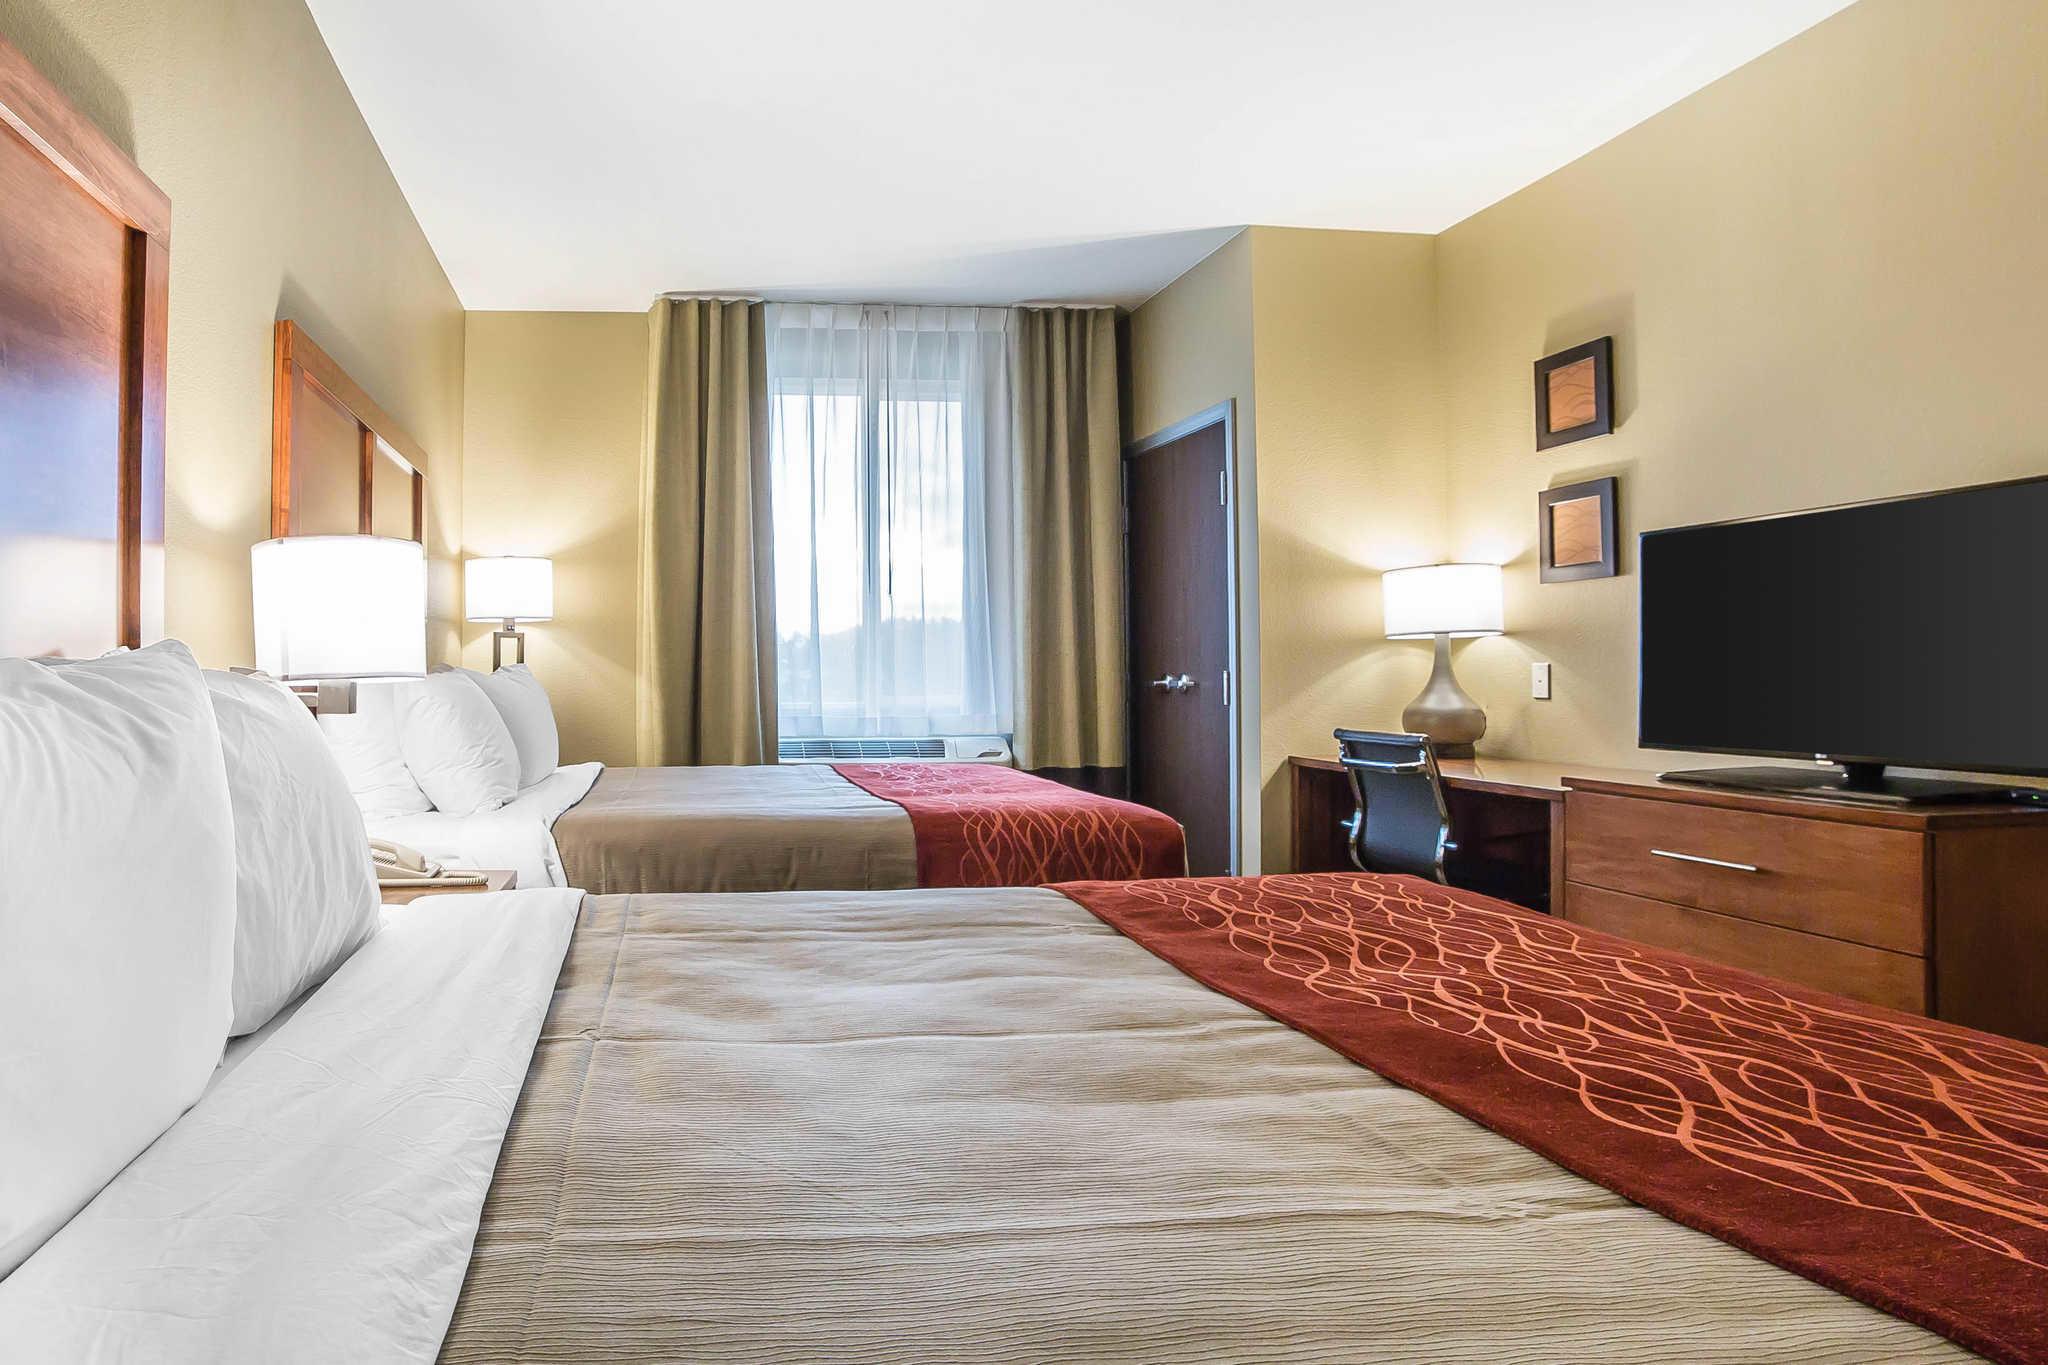 Comfort Inn & Suites Near Mt. Rushmore image 17